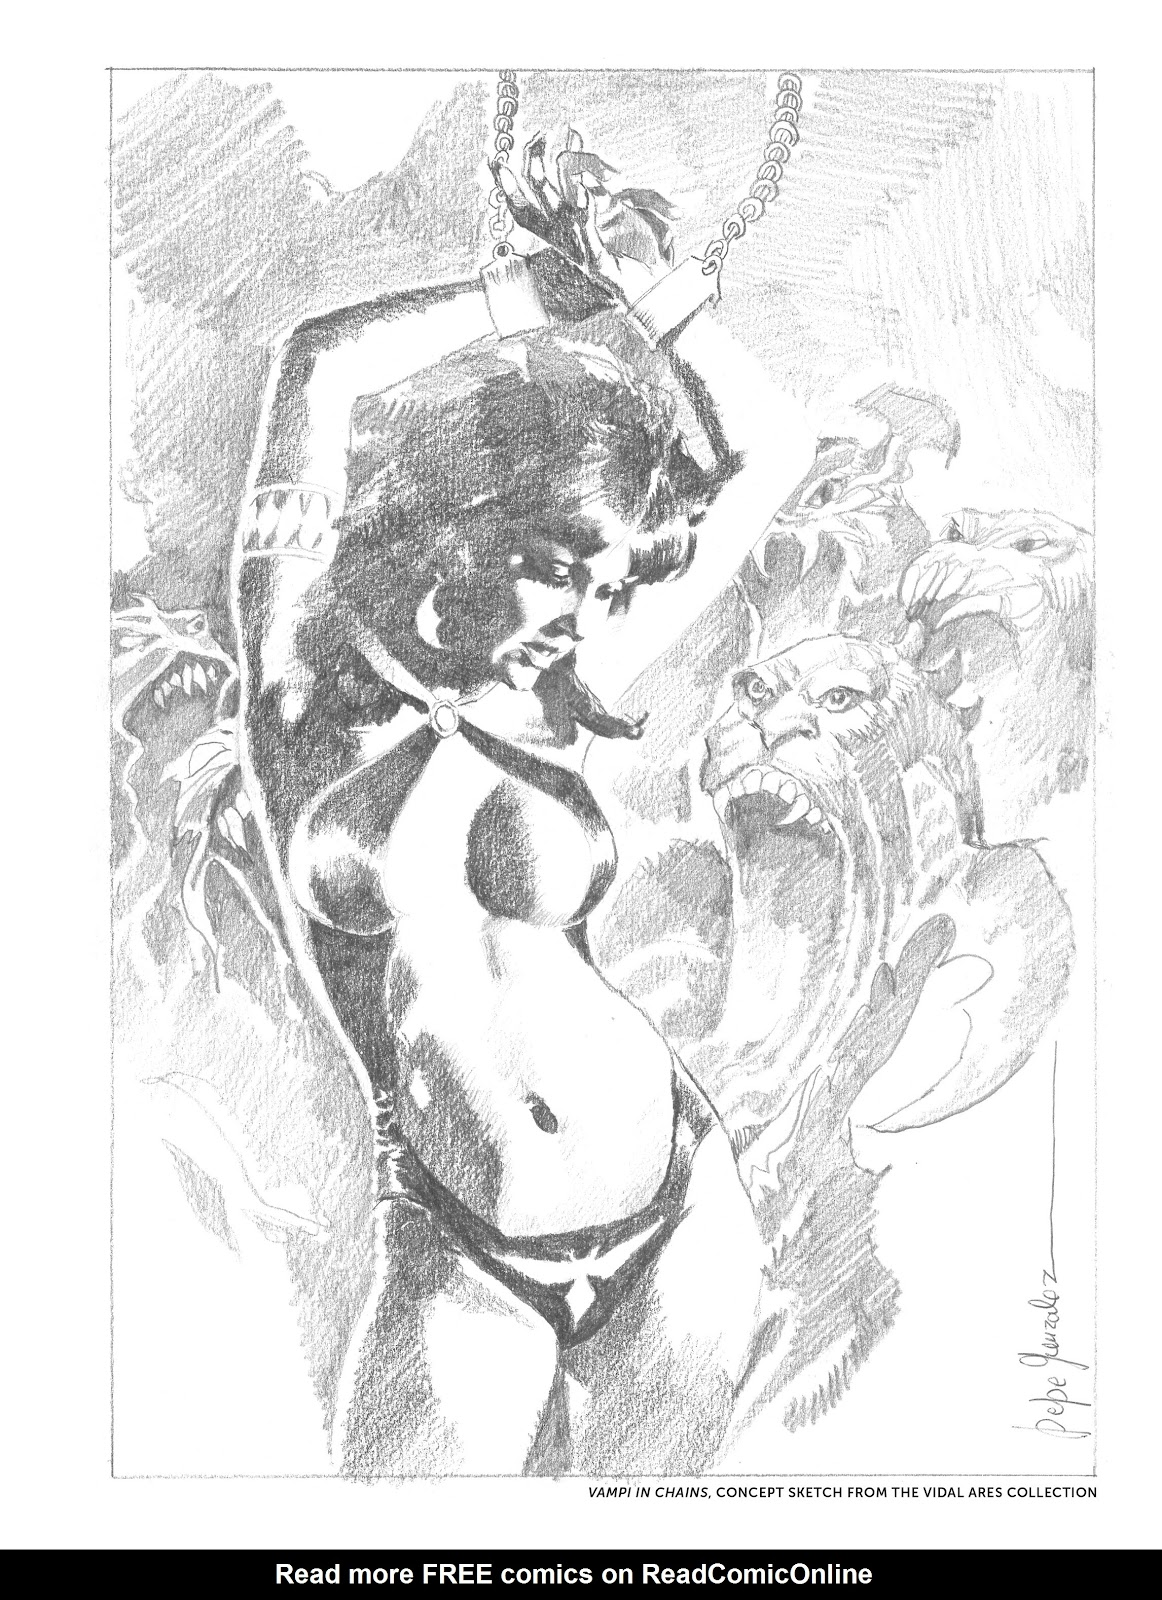 Read online The Art of Jose Gonzalez comic -  Issue # TPB (Part 2) - 35